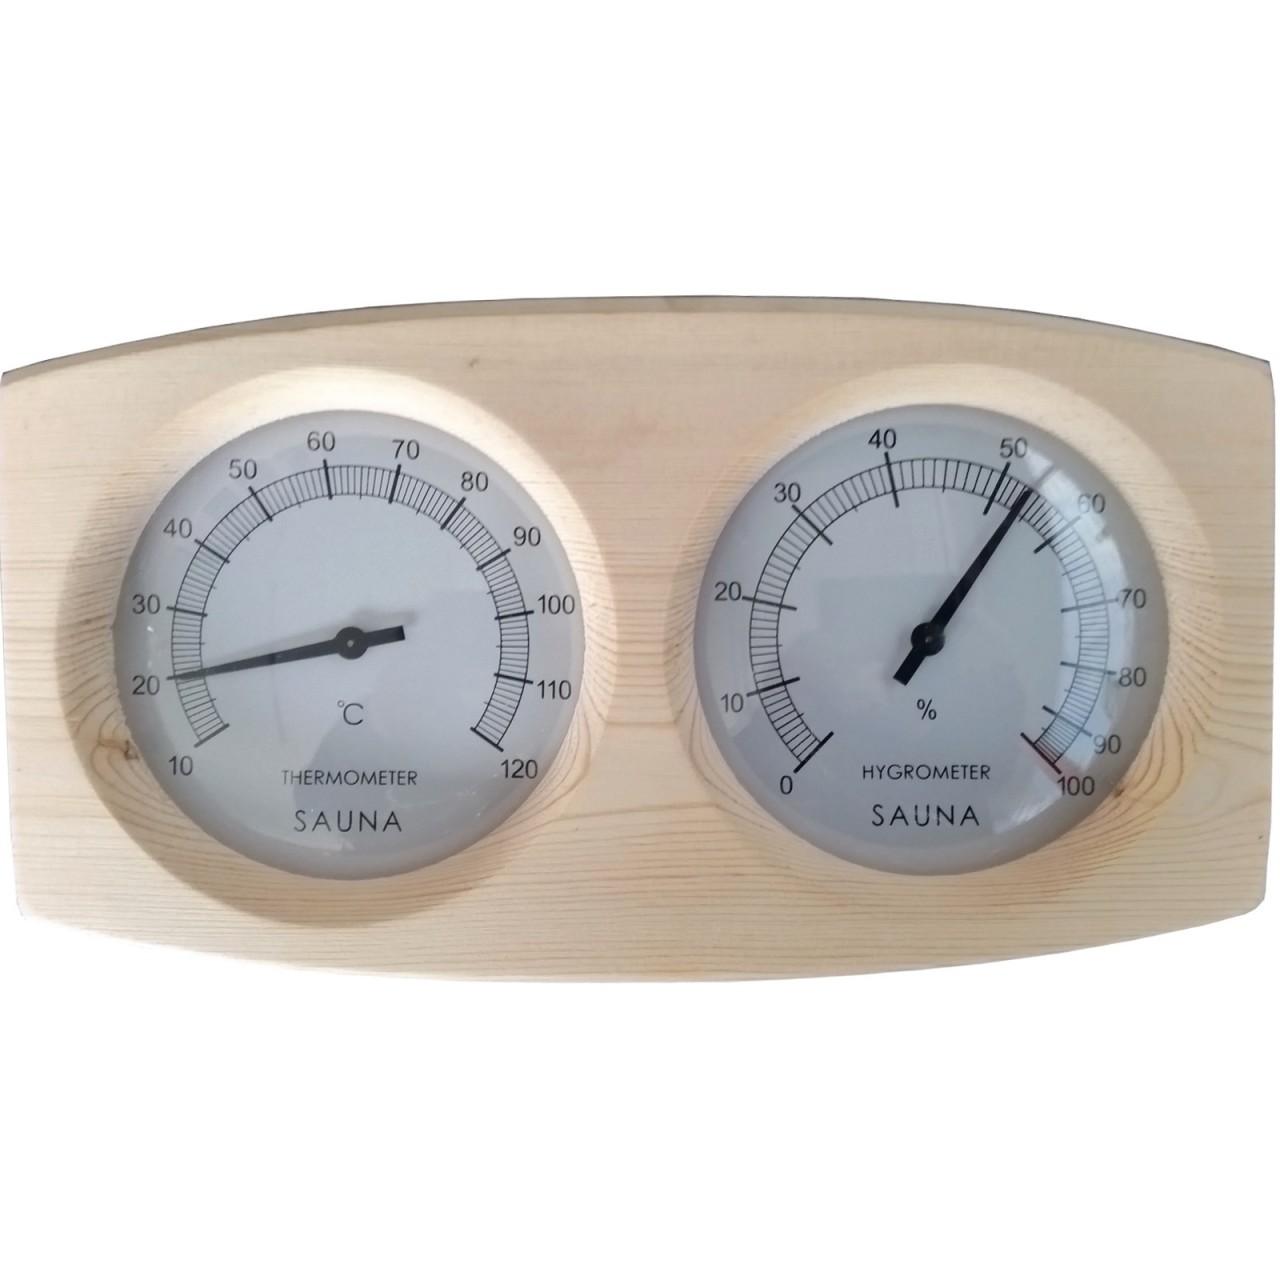 Sauna Thermometer Hygrometer ANNA MODERN